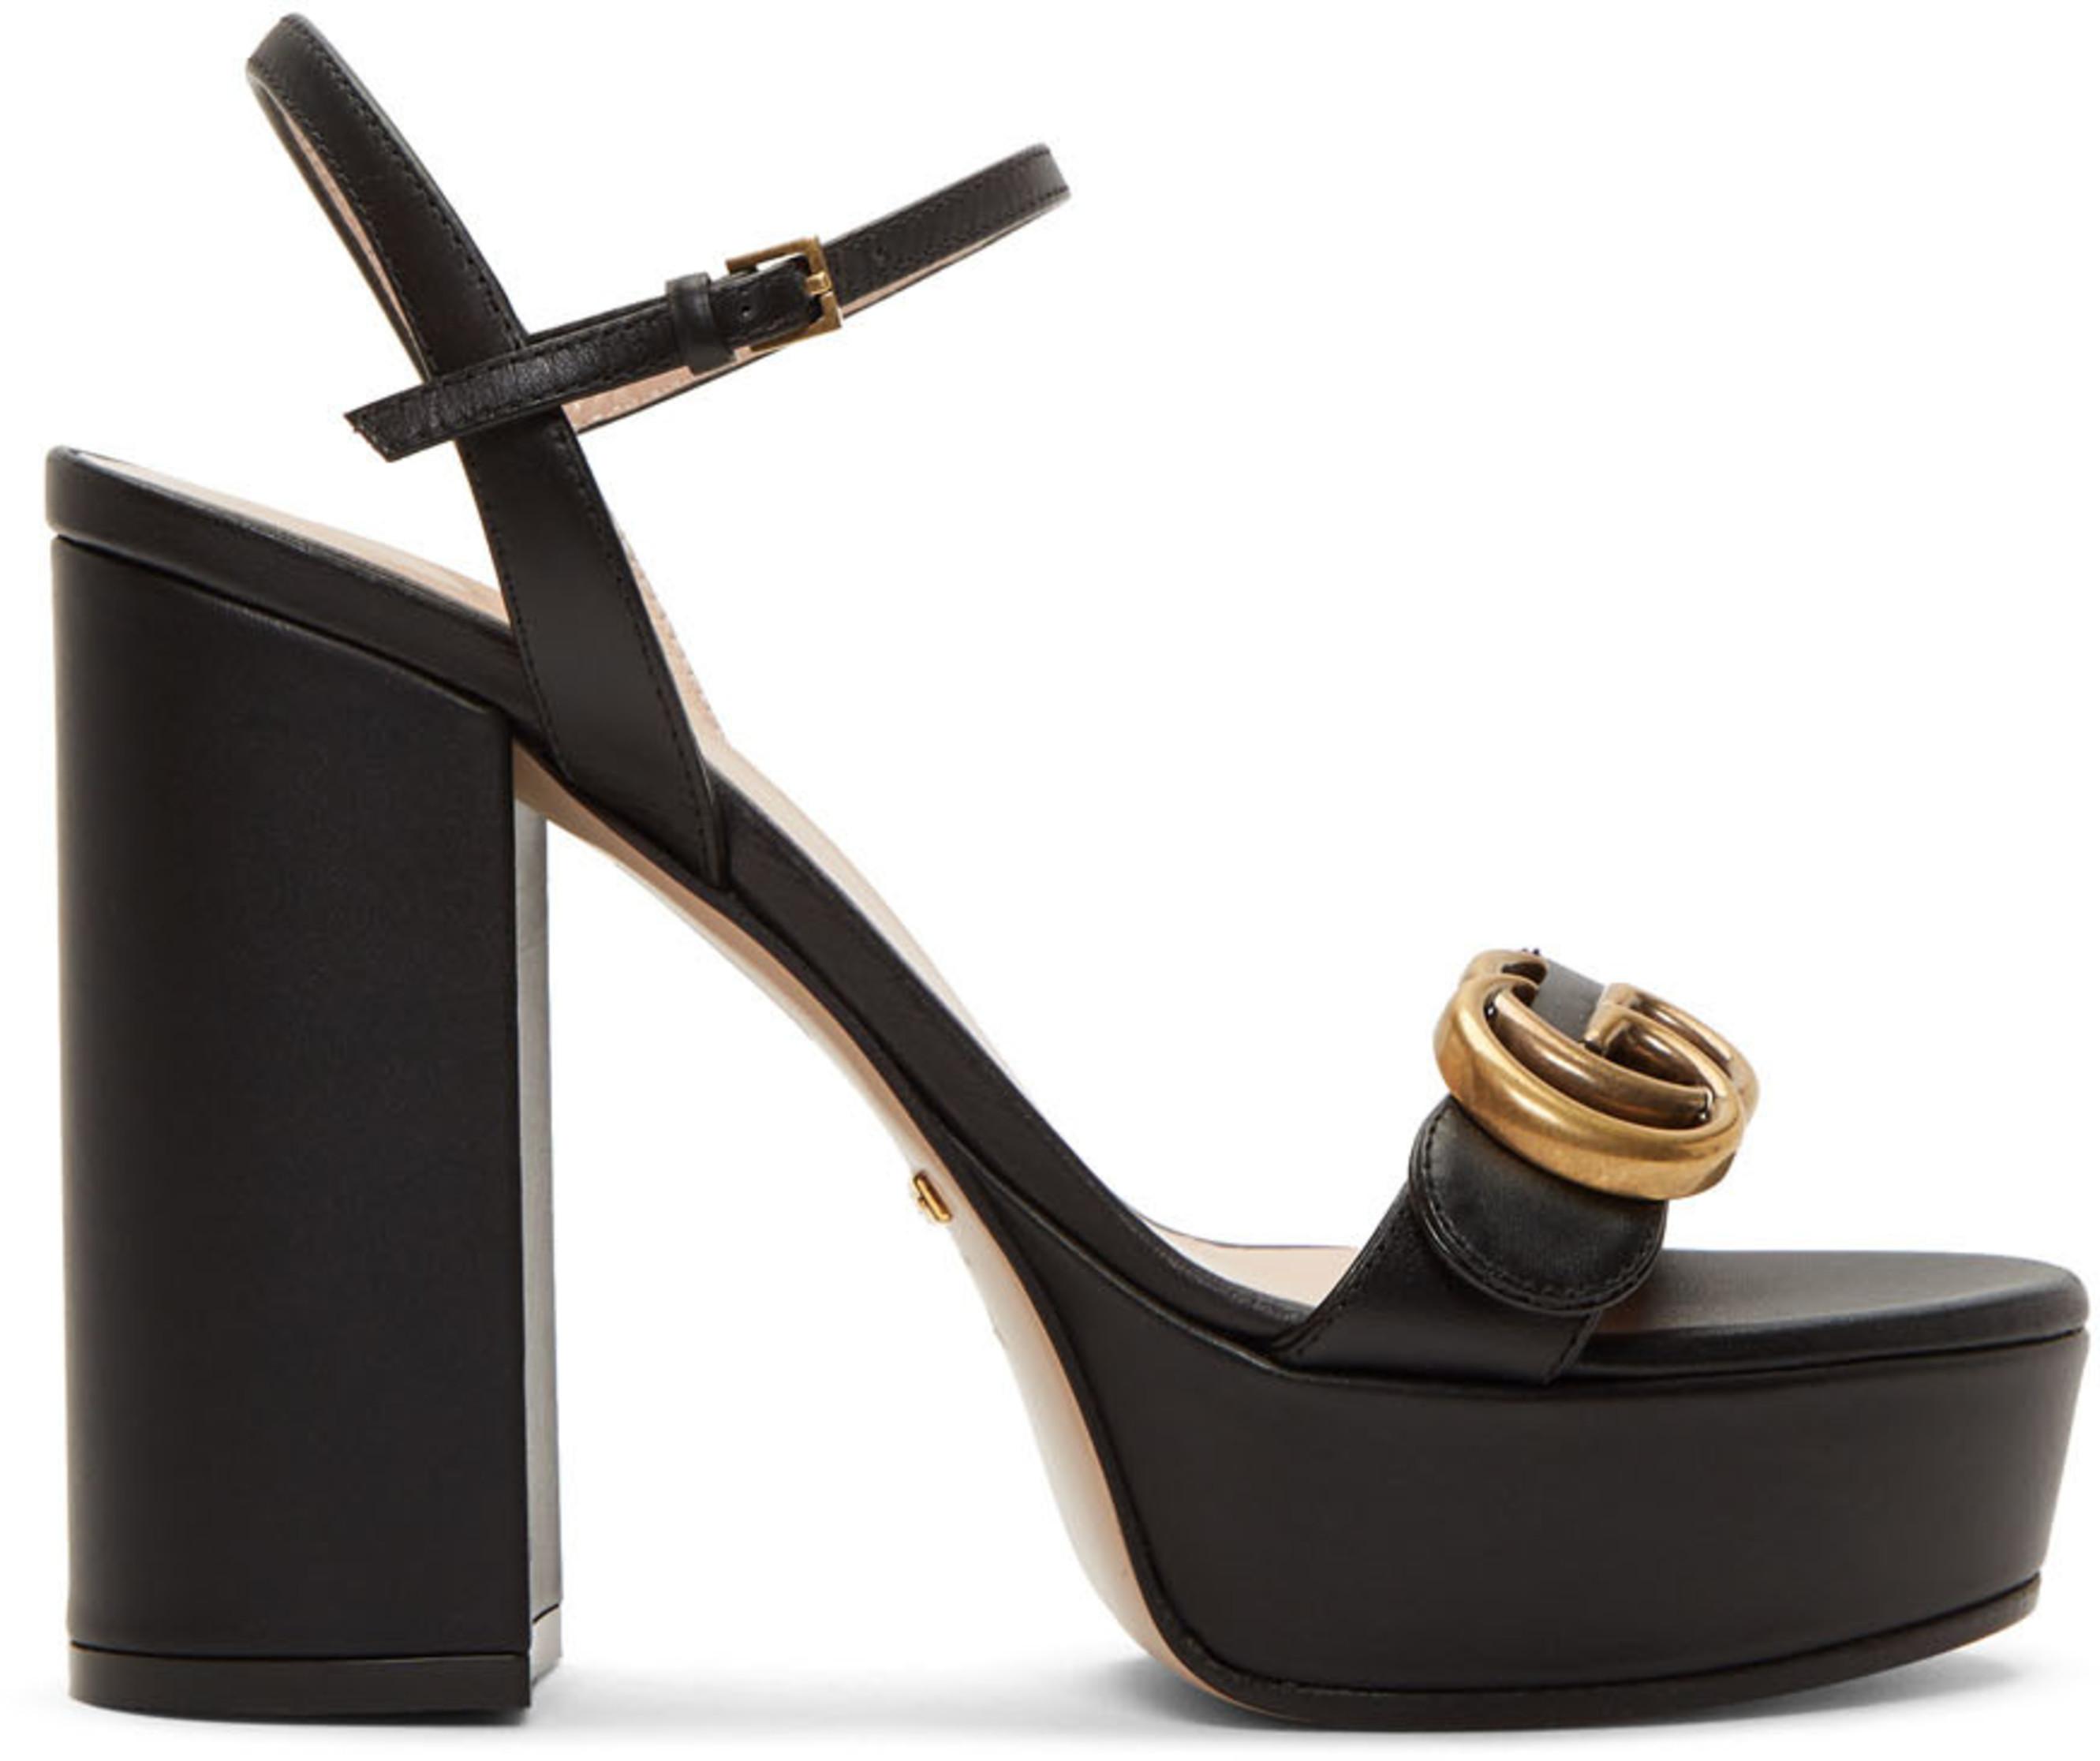 Gg Gg Black Gg Platform Platform Sandals Black Black Sandals wO8yvmN0nP